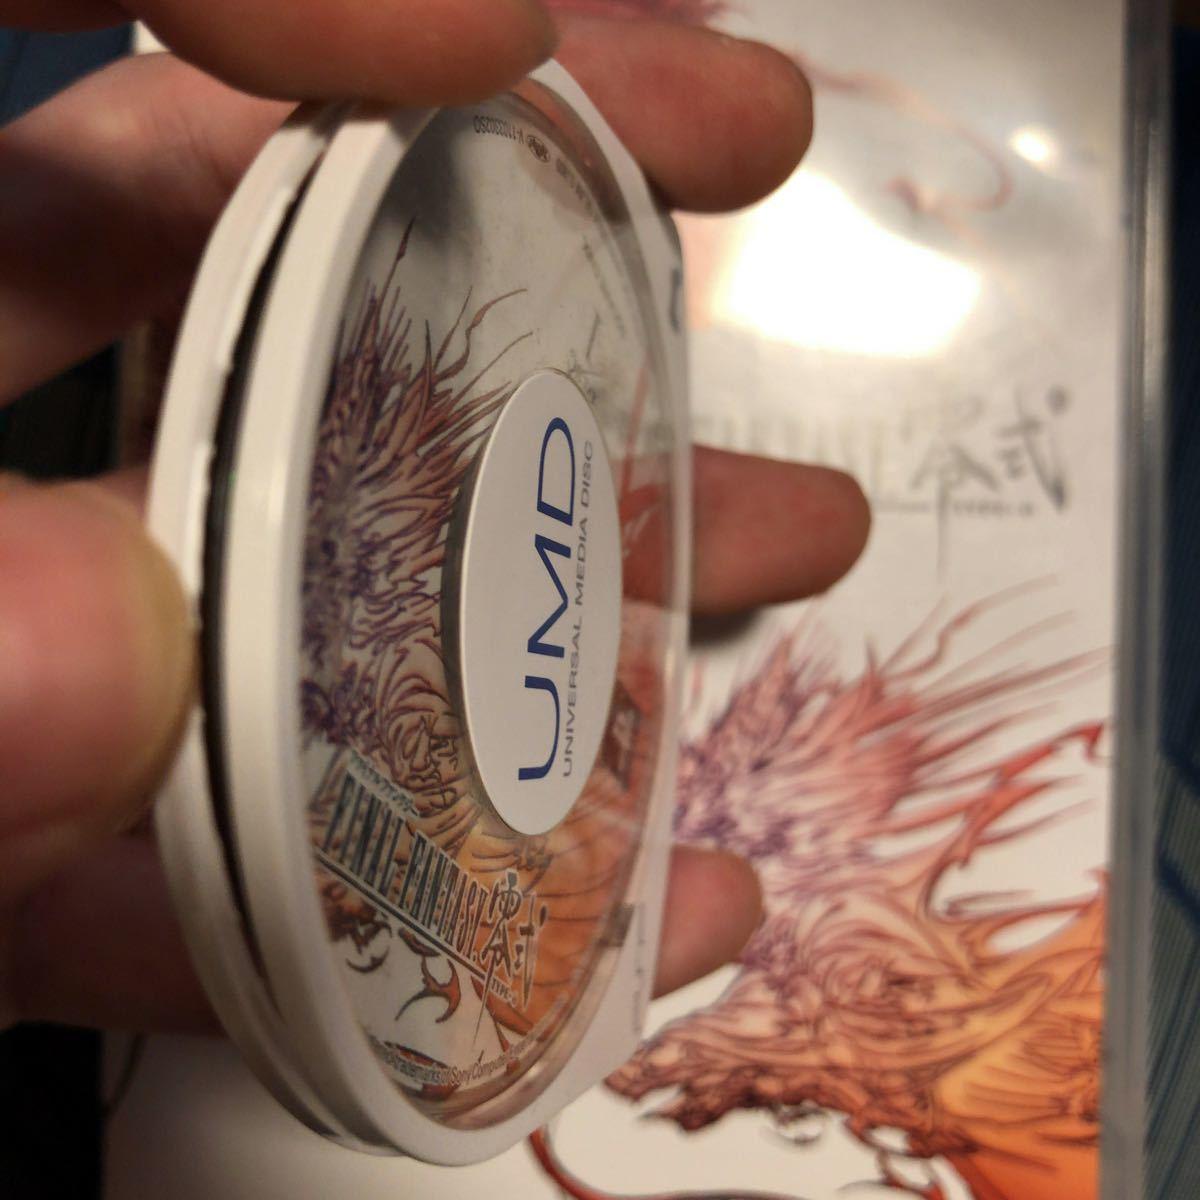 PSPソフトまとめ キングダムハーツ テイルズ ファイナルファンタジー ディスガイア 他 セット 17本